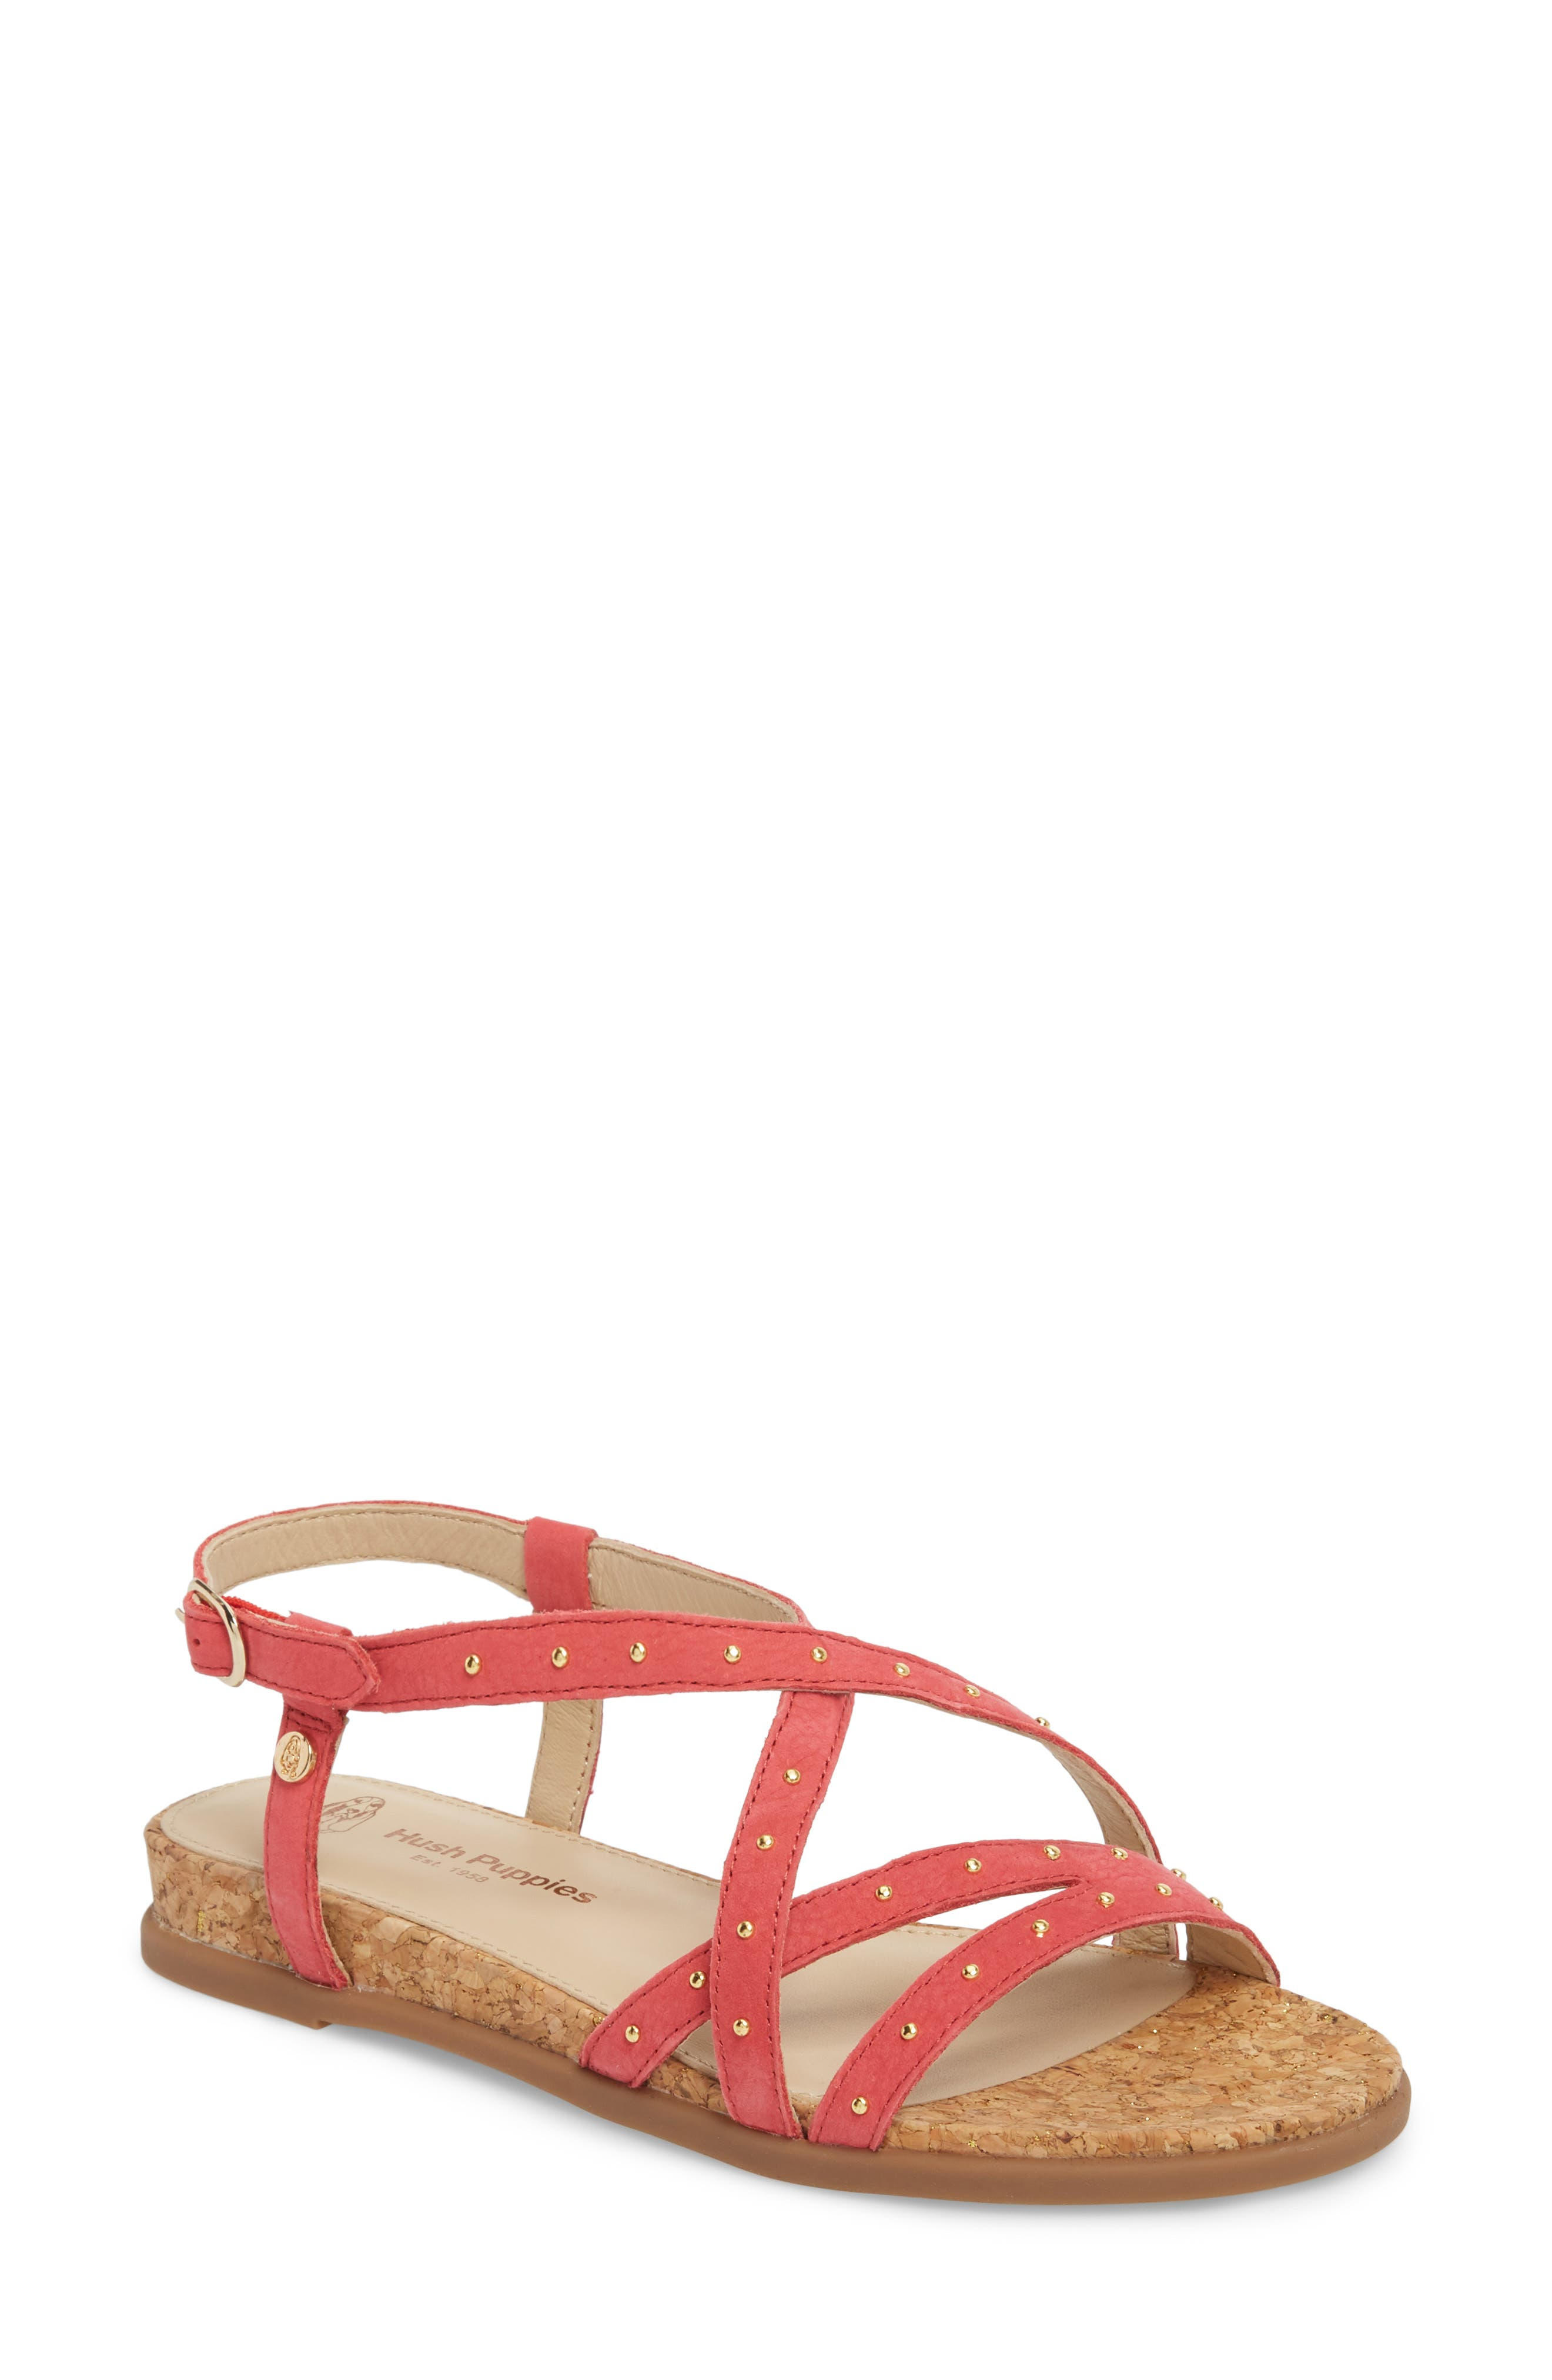 Hush Puppies® Dalmatian Studded Sandal (Women)